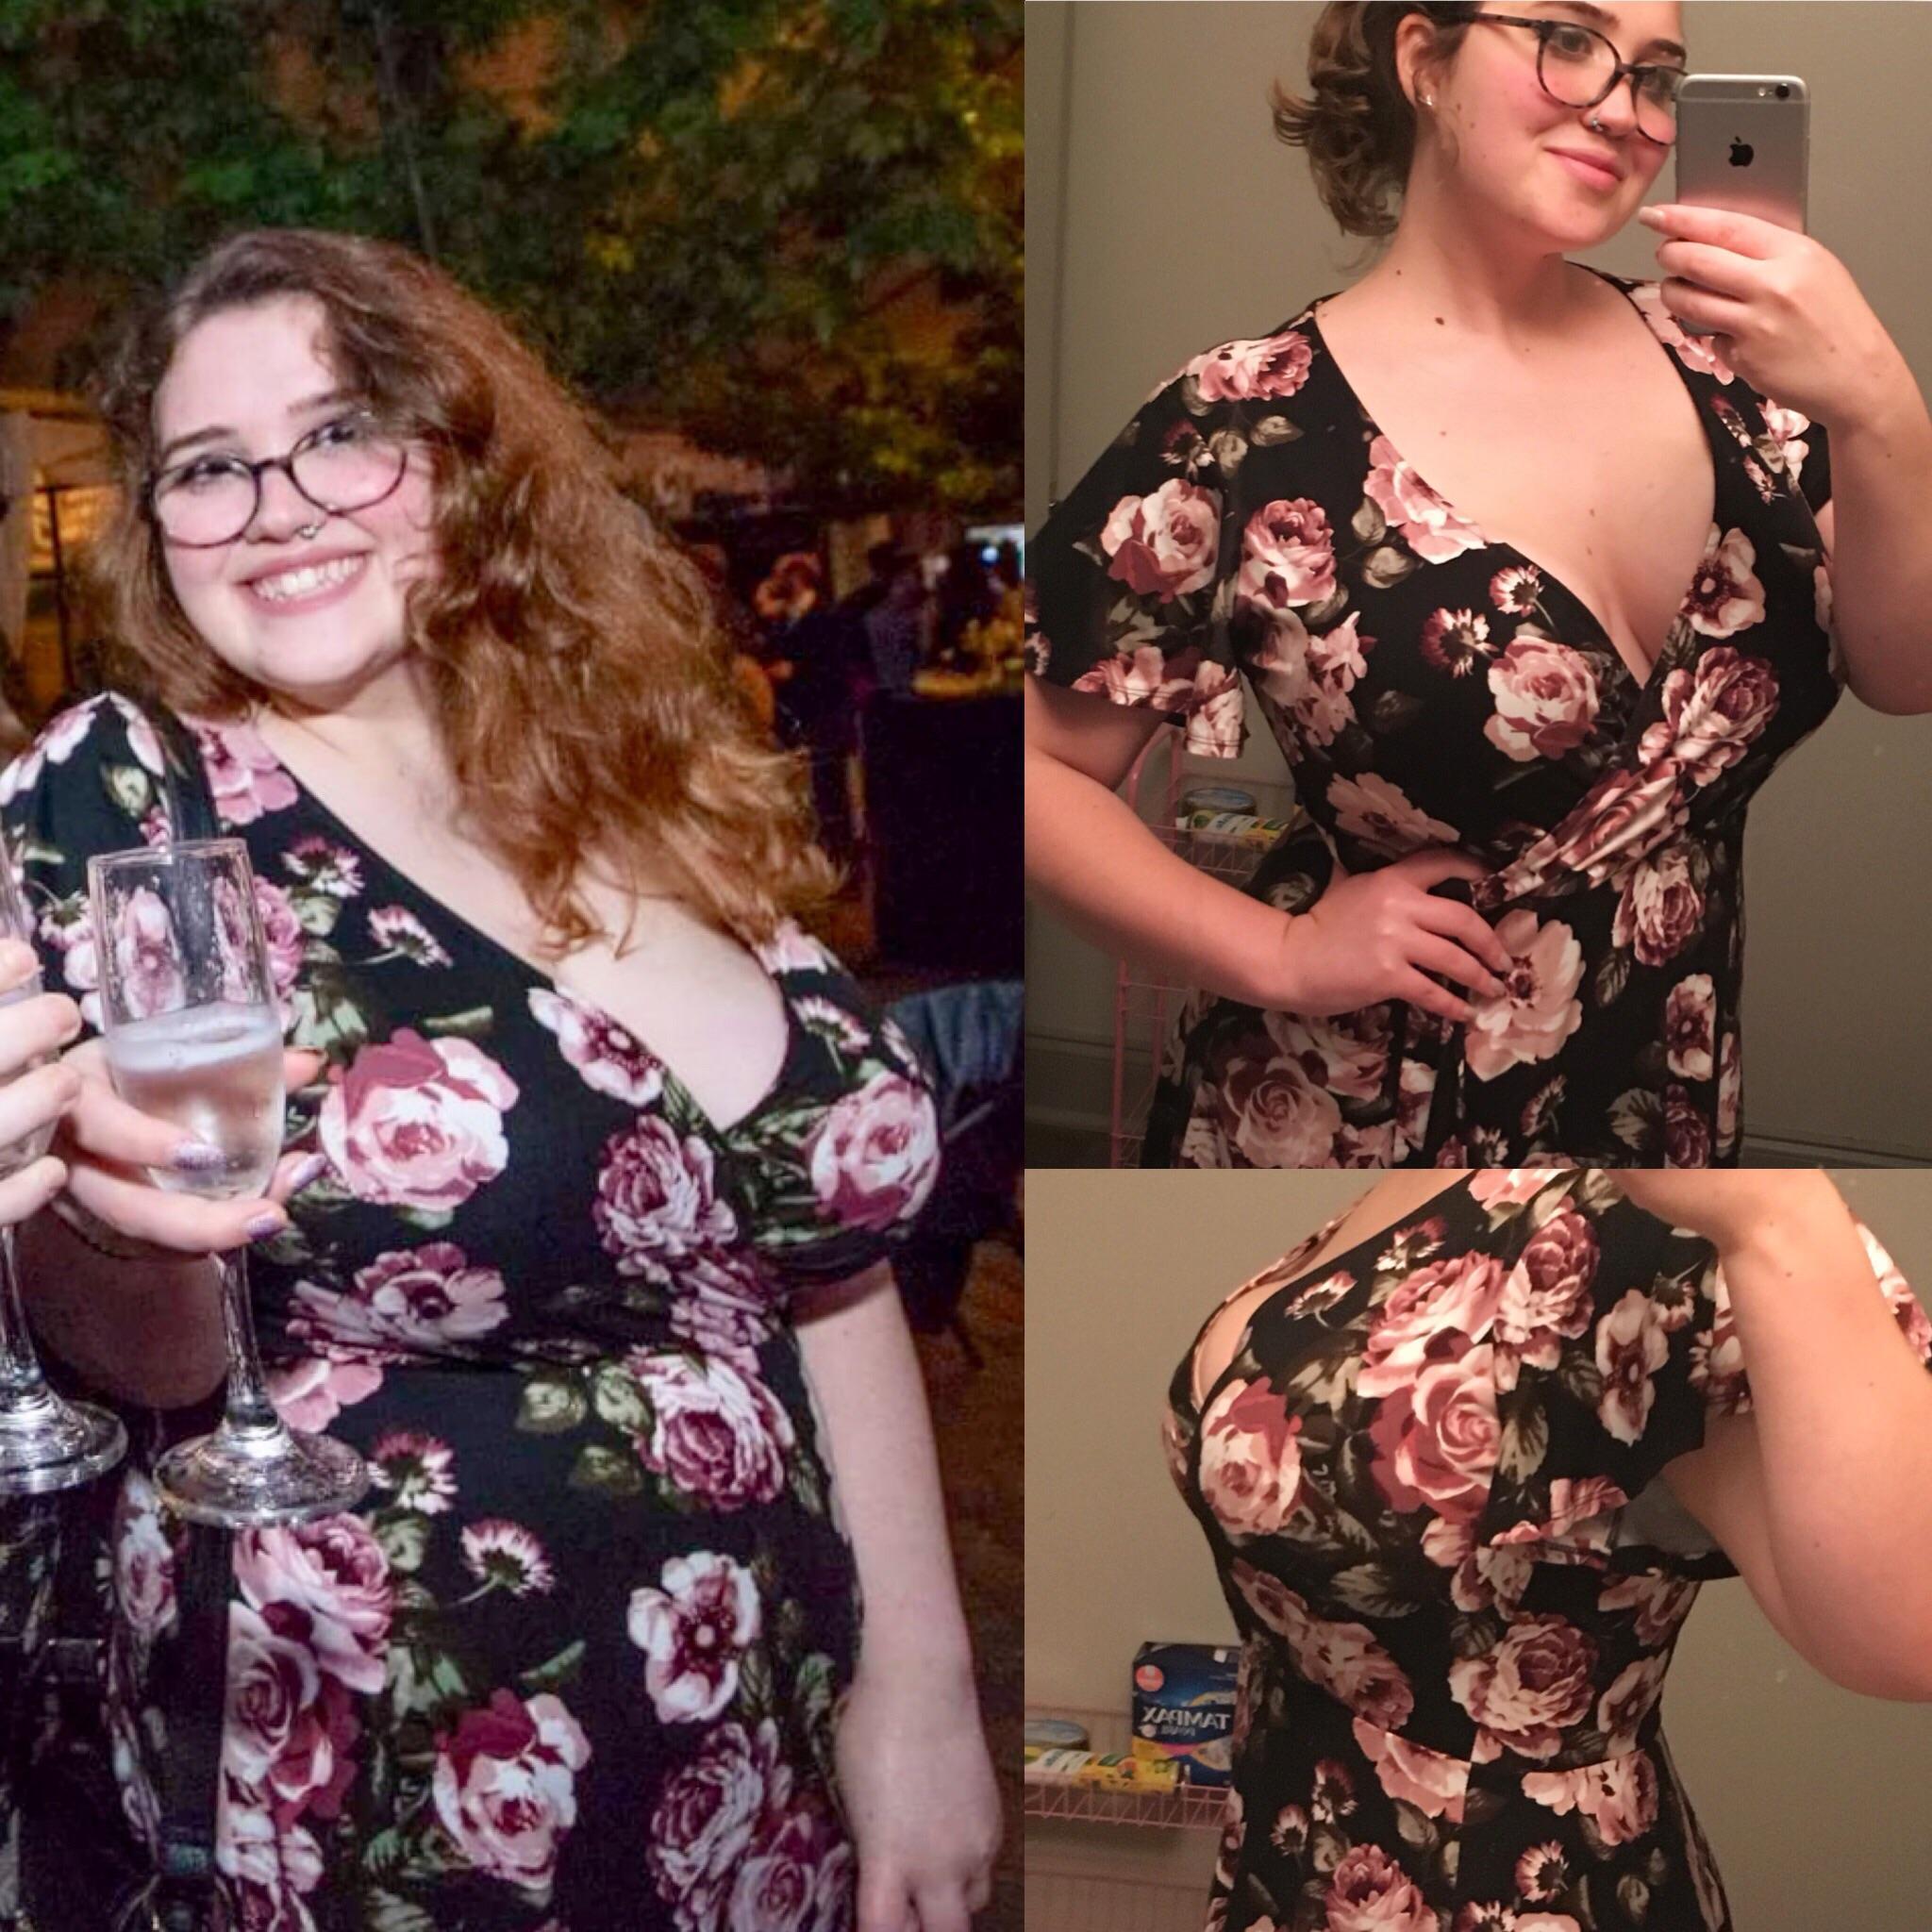 5 feet 5 Female 38 lbs Fat Loss 230 lbs to 192 lbs